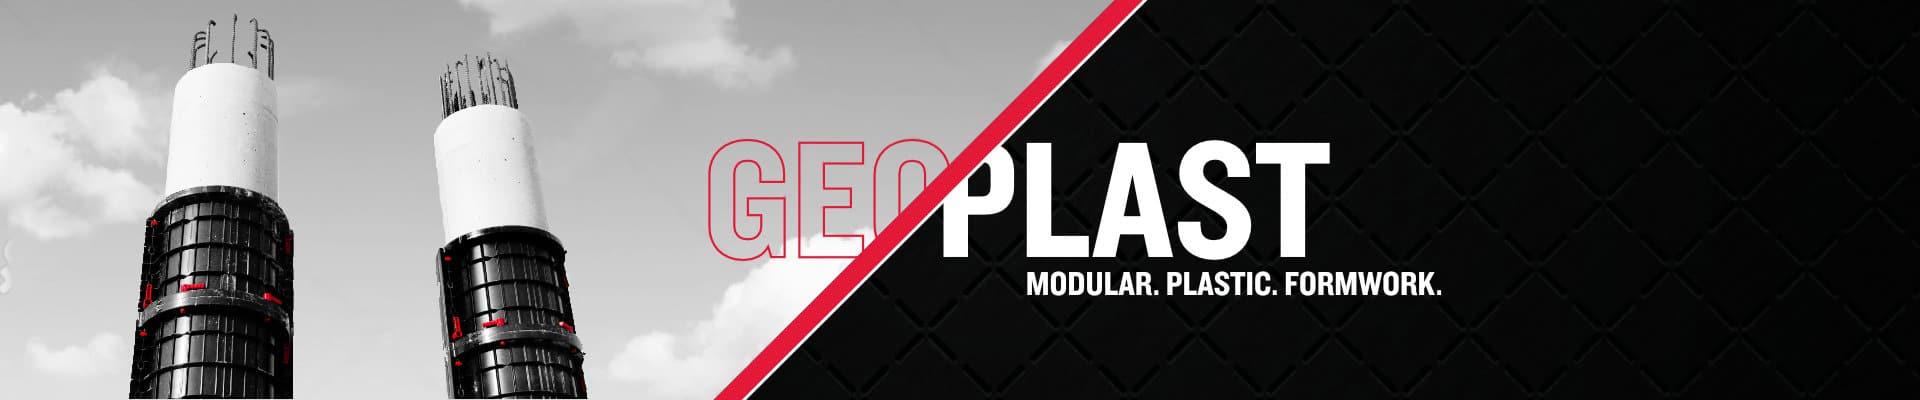 Geoplast modular formwork